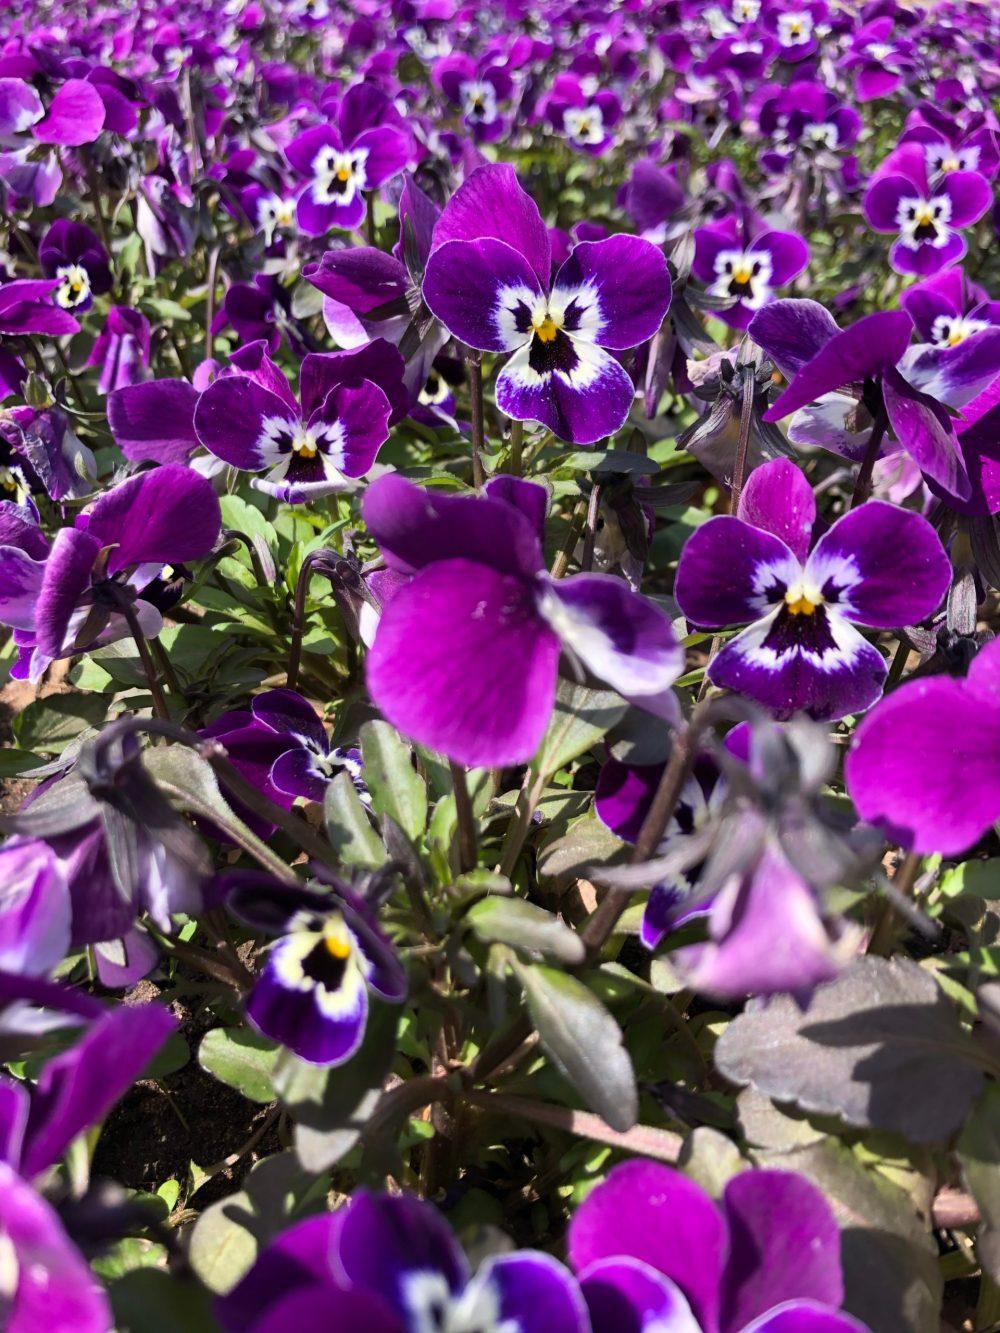 Hunderte lilafarbene Stiefmütterchen im Blumengarten in Bexbach im Frühling